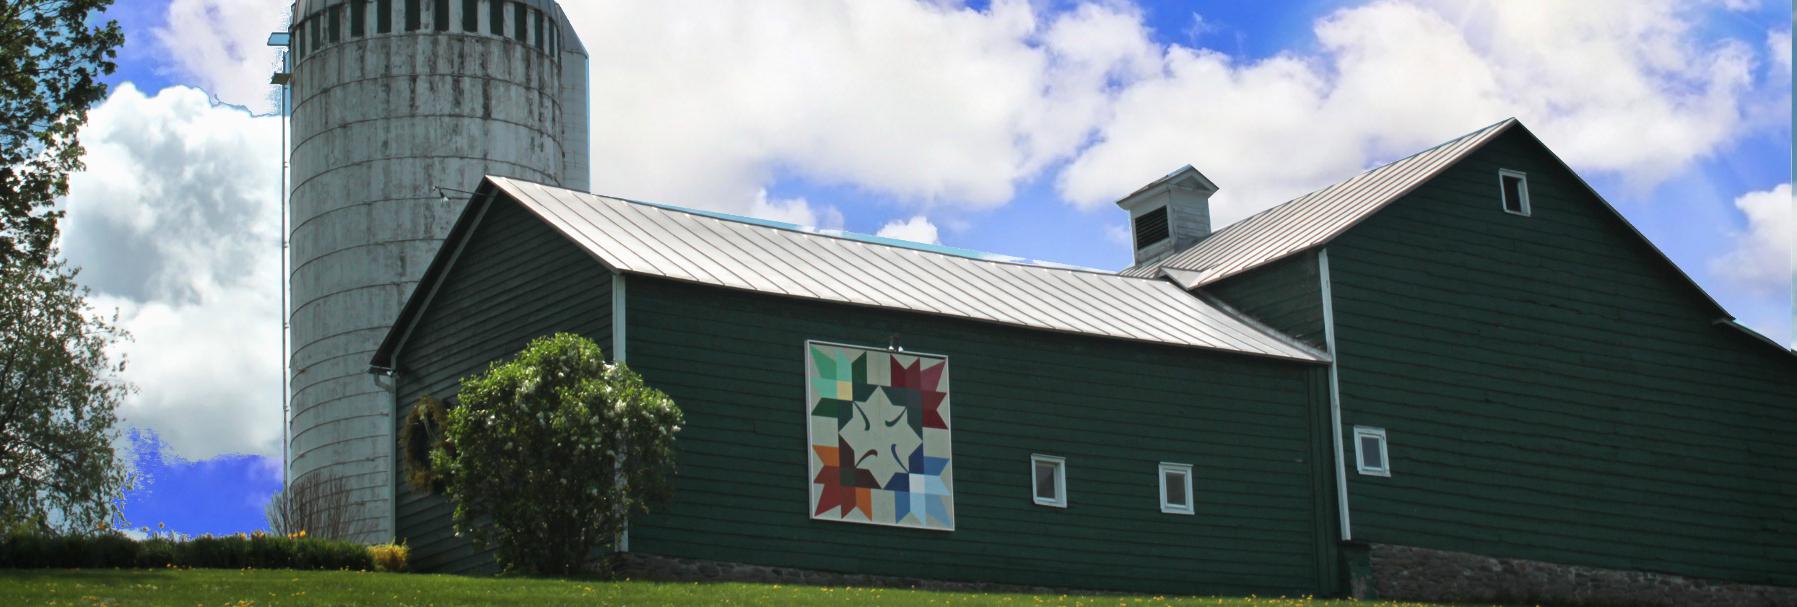 quilt barn photo - schoharie quilt barn trail